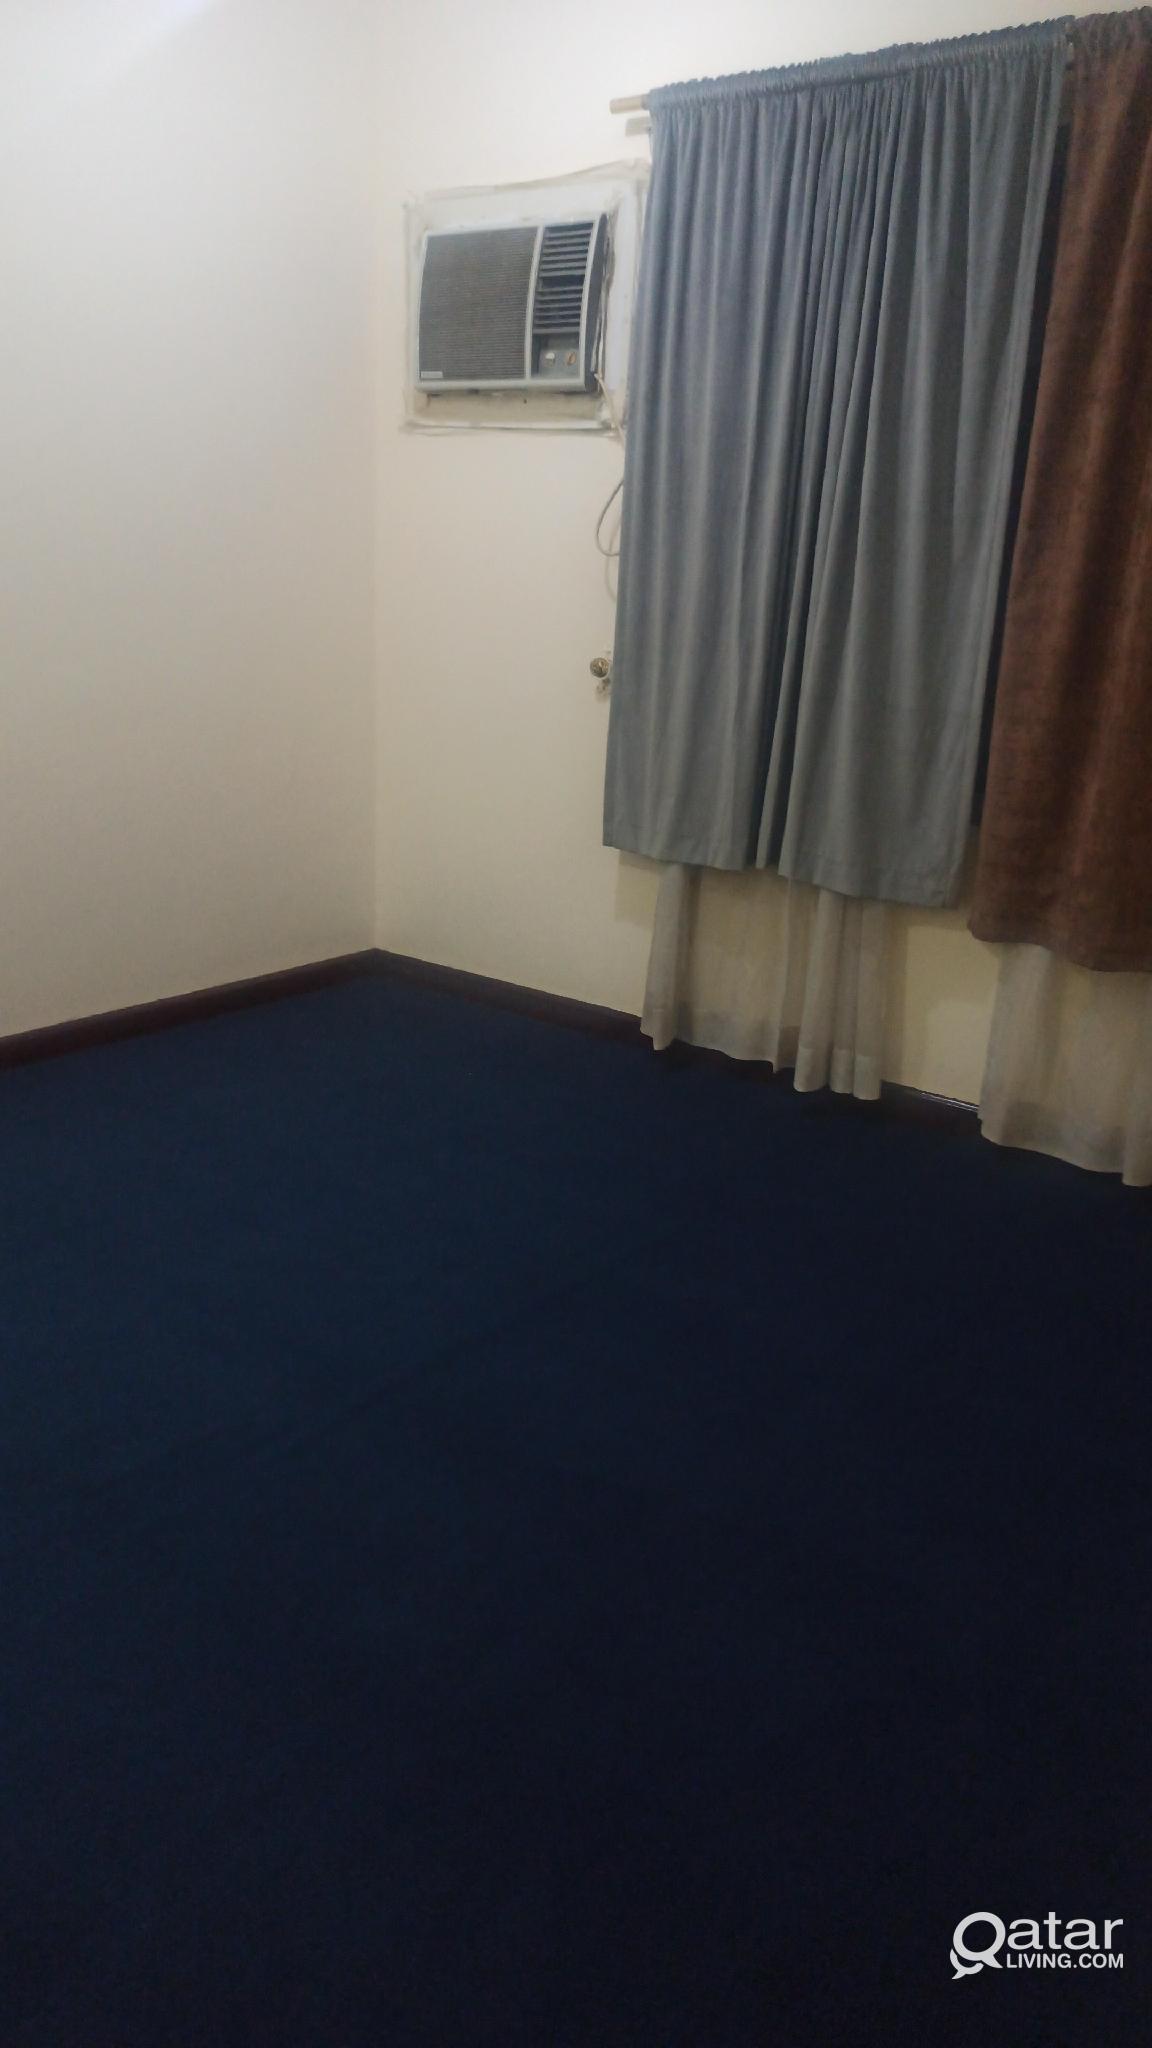 Executive bedspace for kerala tamil